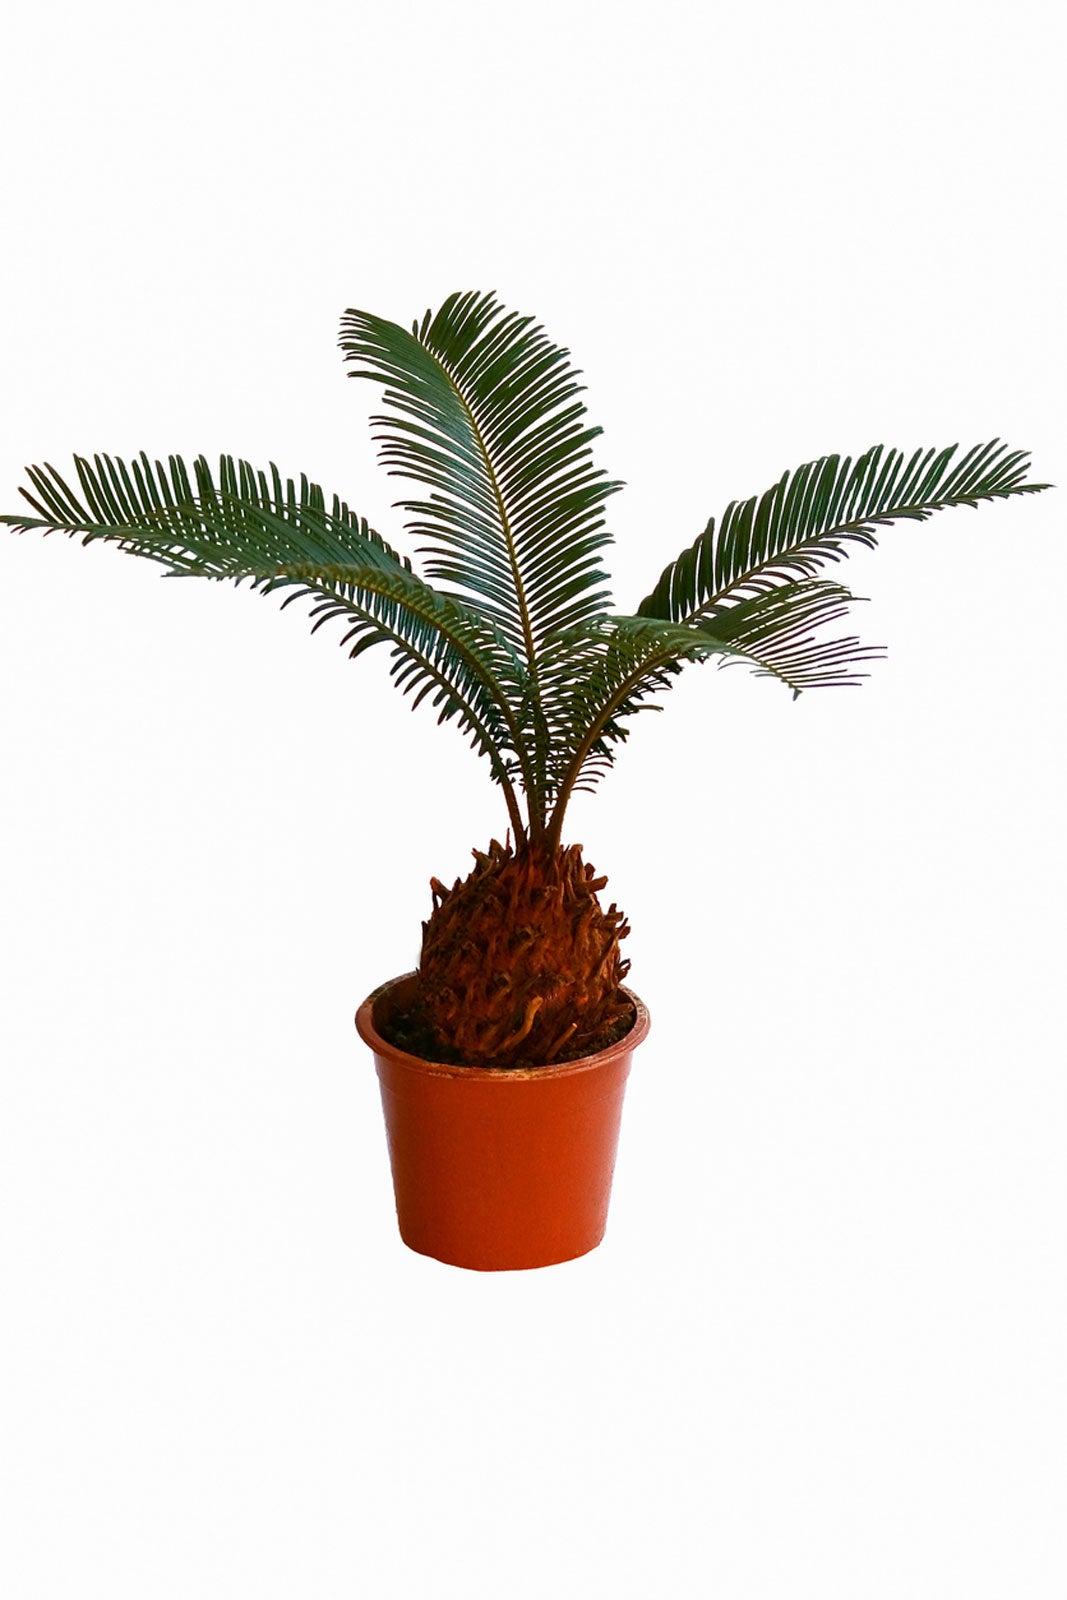 Bonsai Sago Palm Tree How To Grow A Miniature Sago Palm